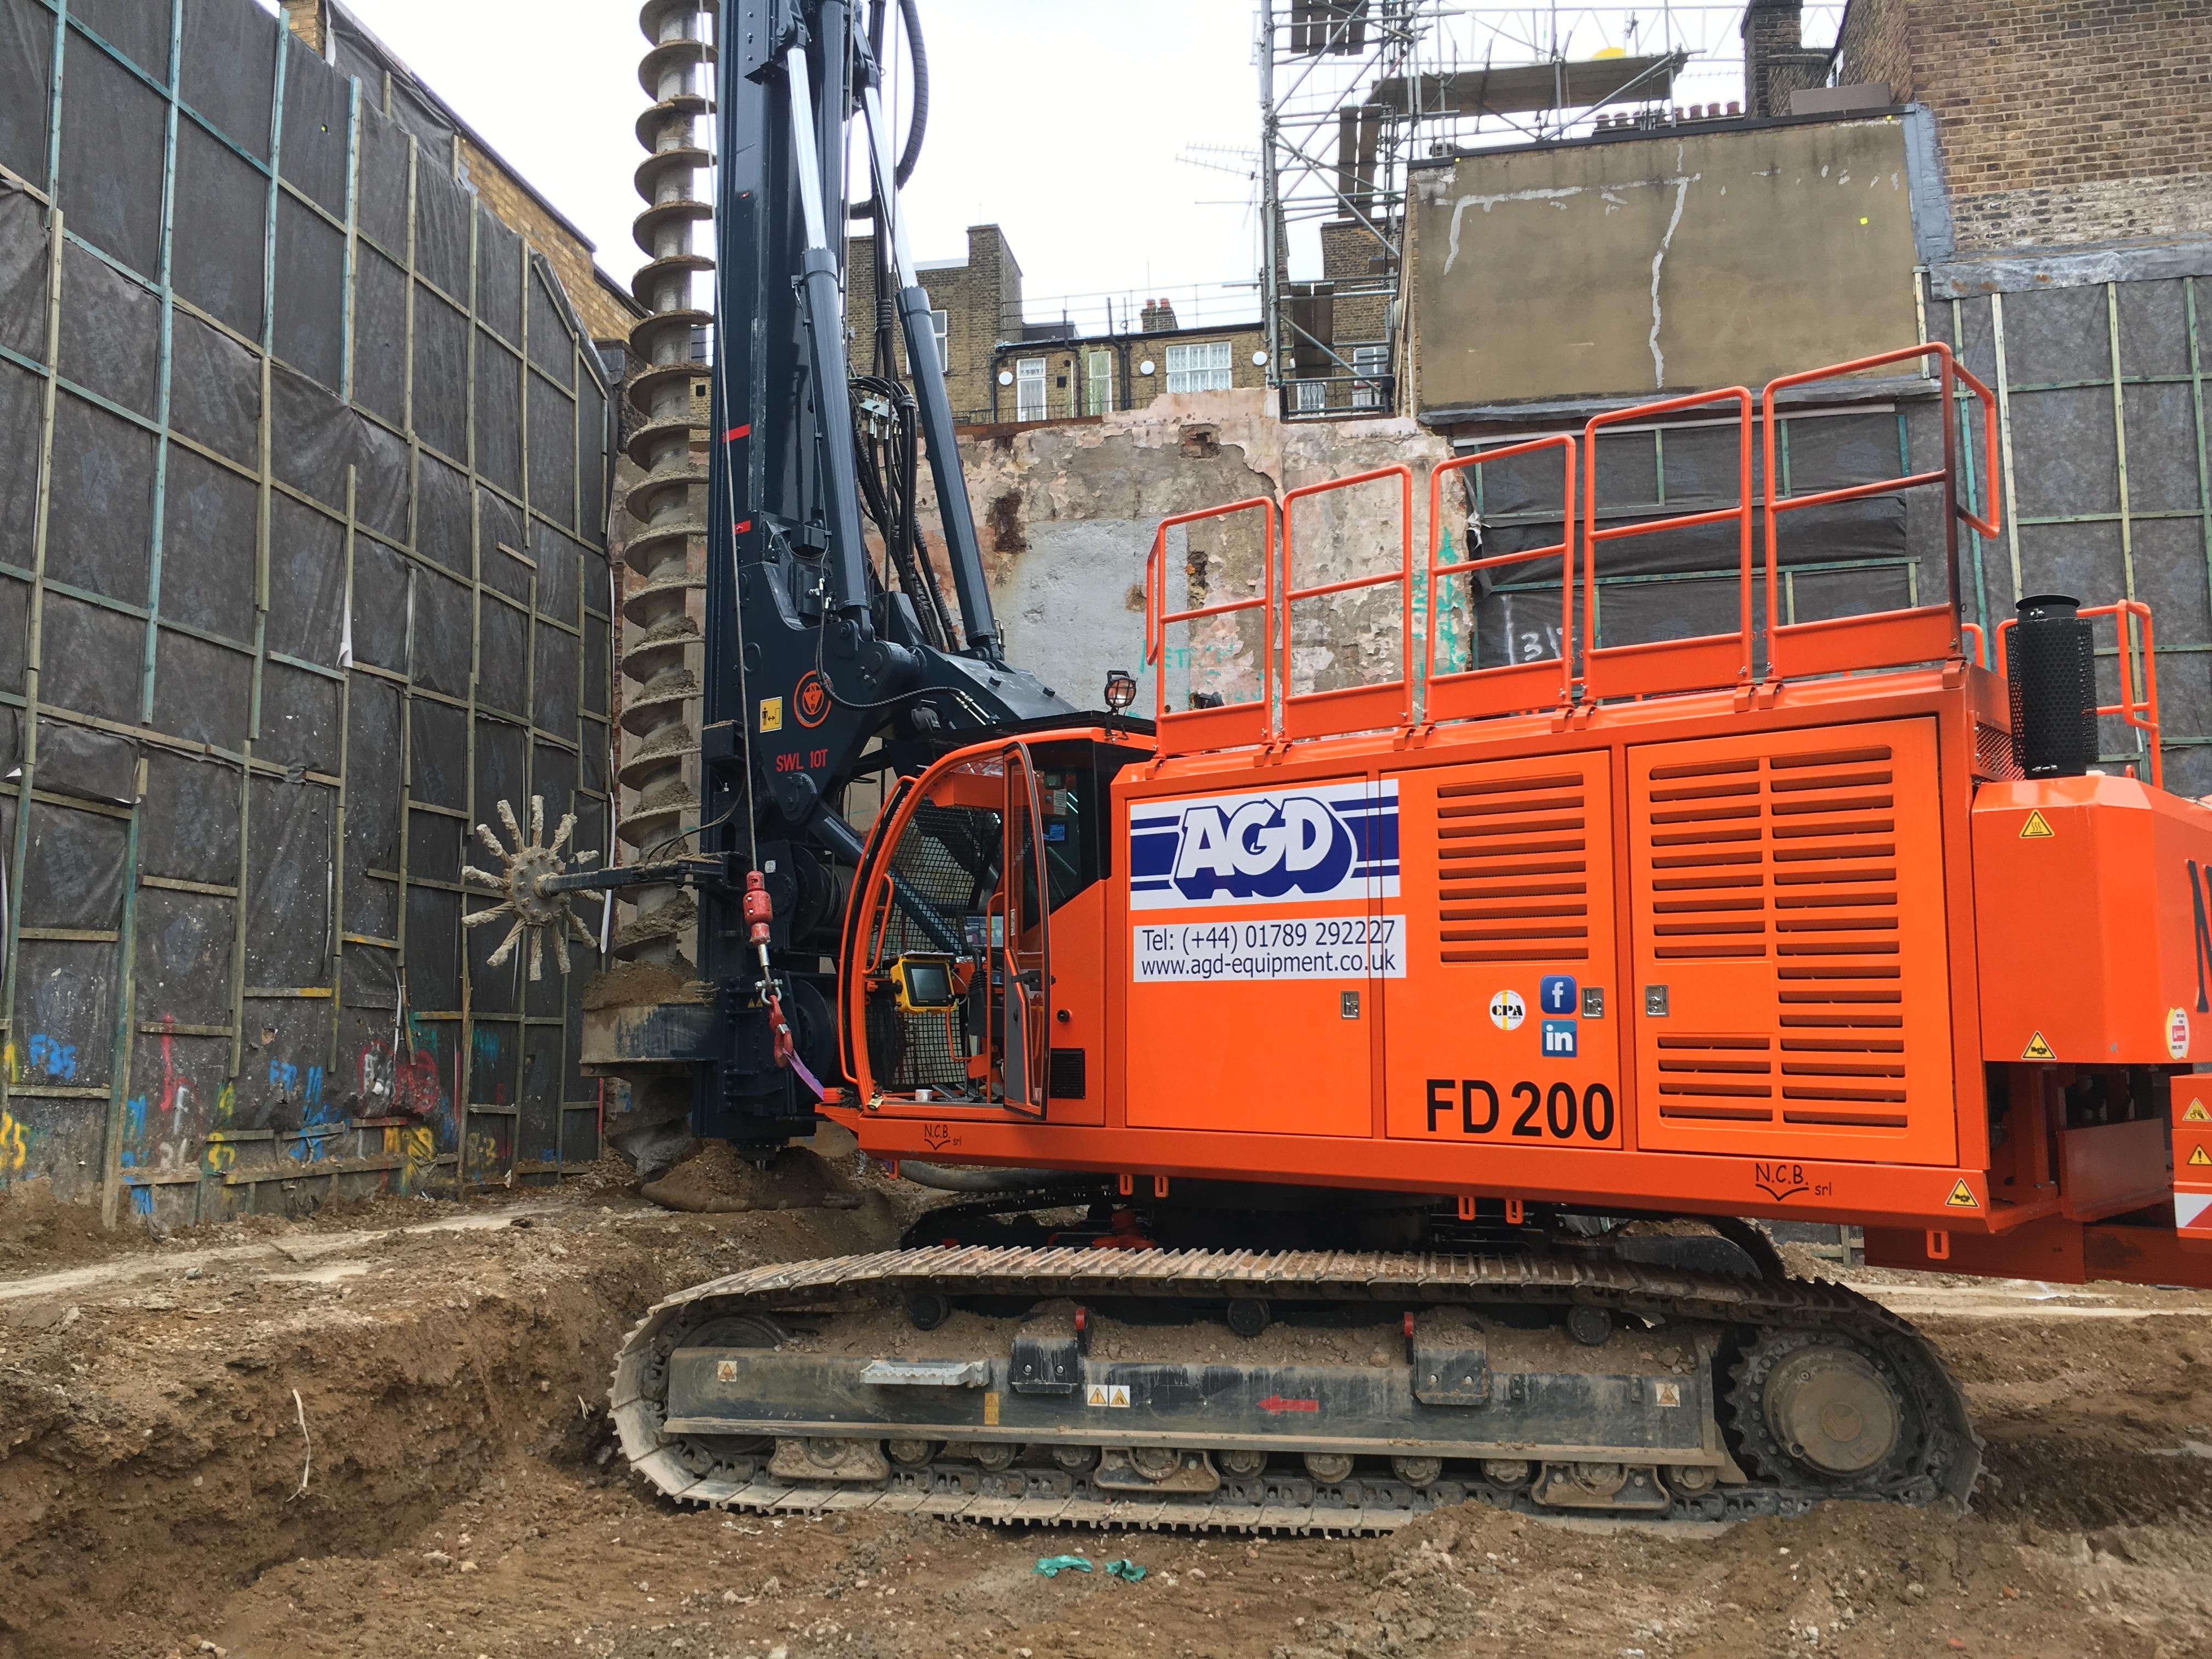 NCB FD200 CFA piling rig